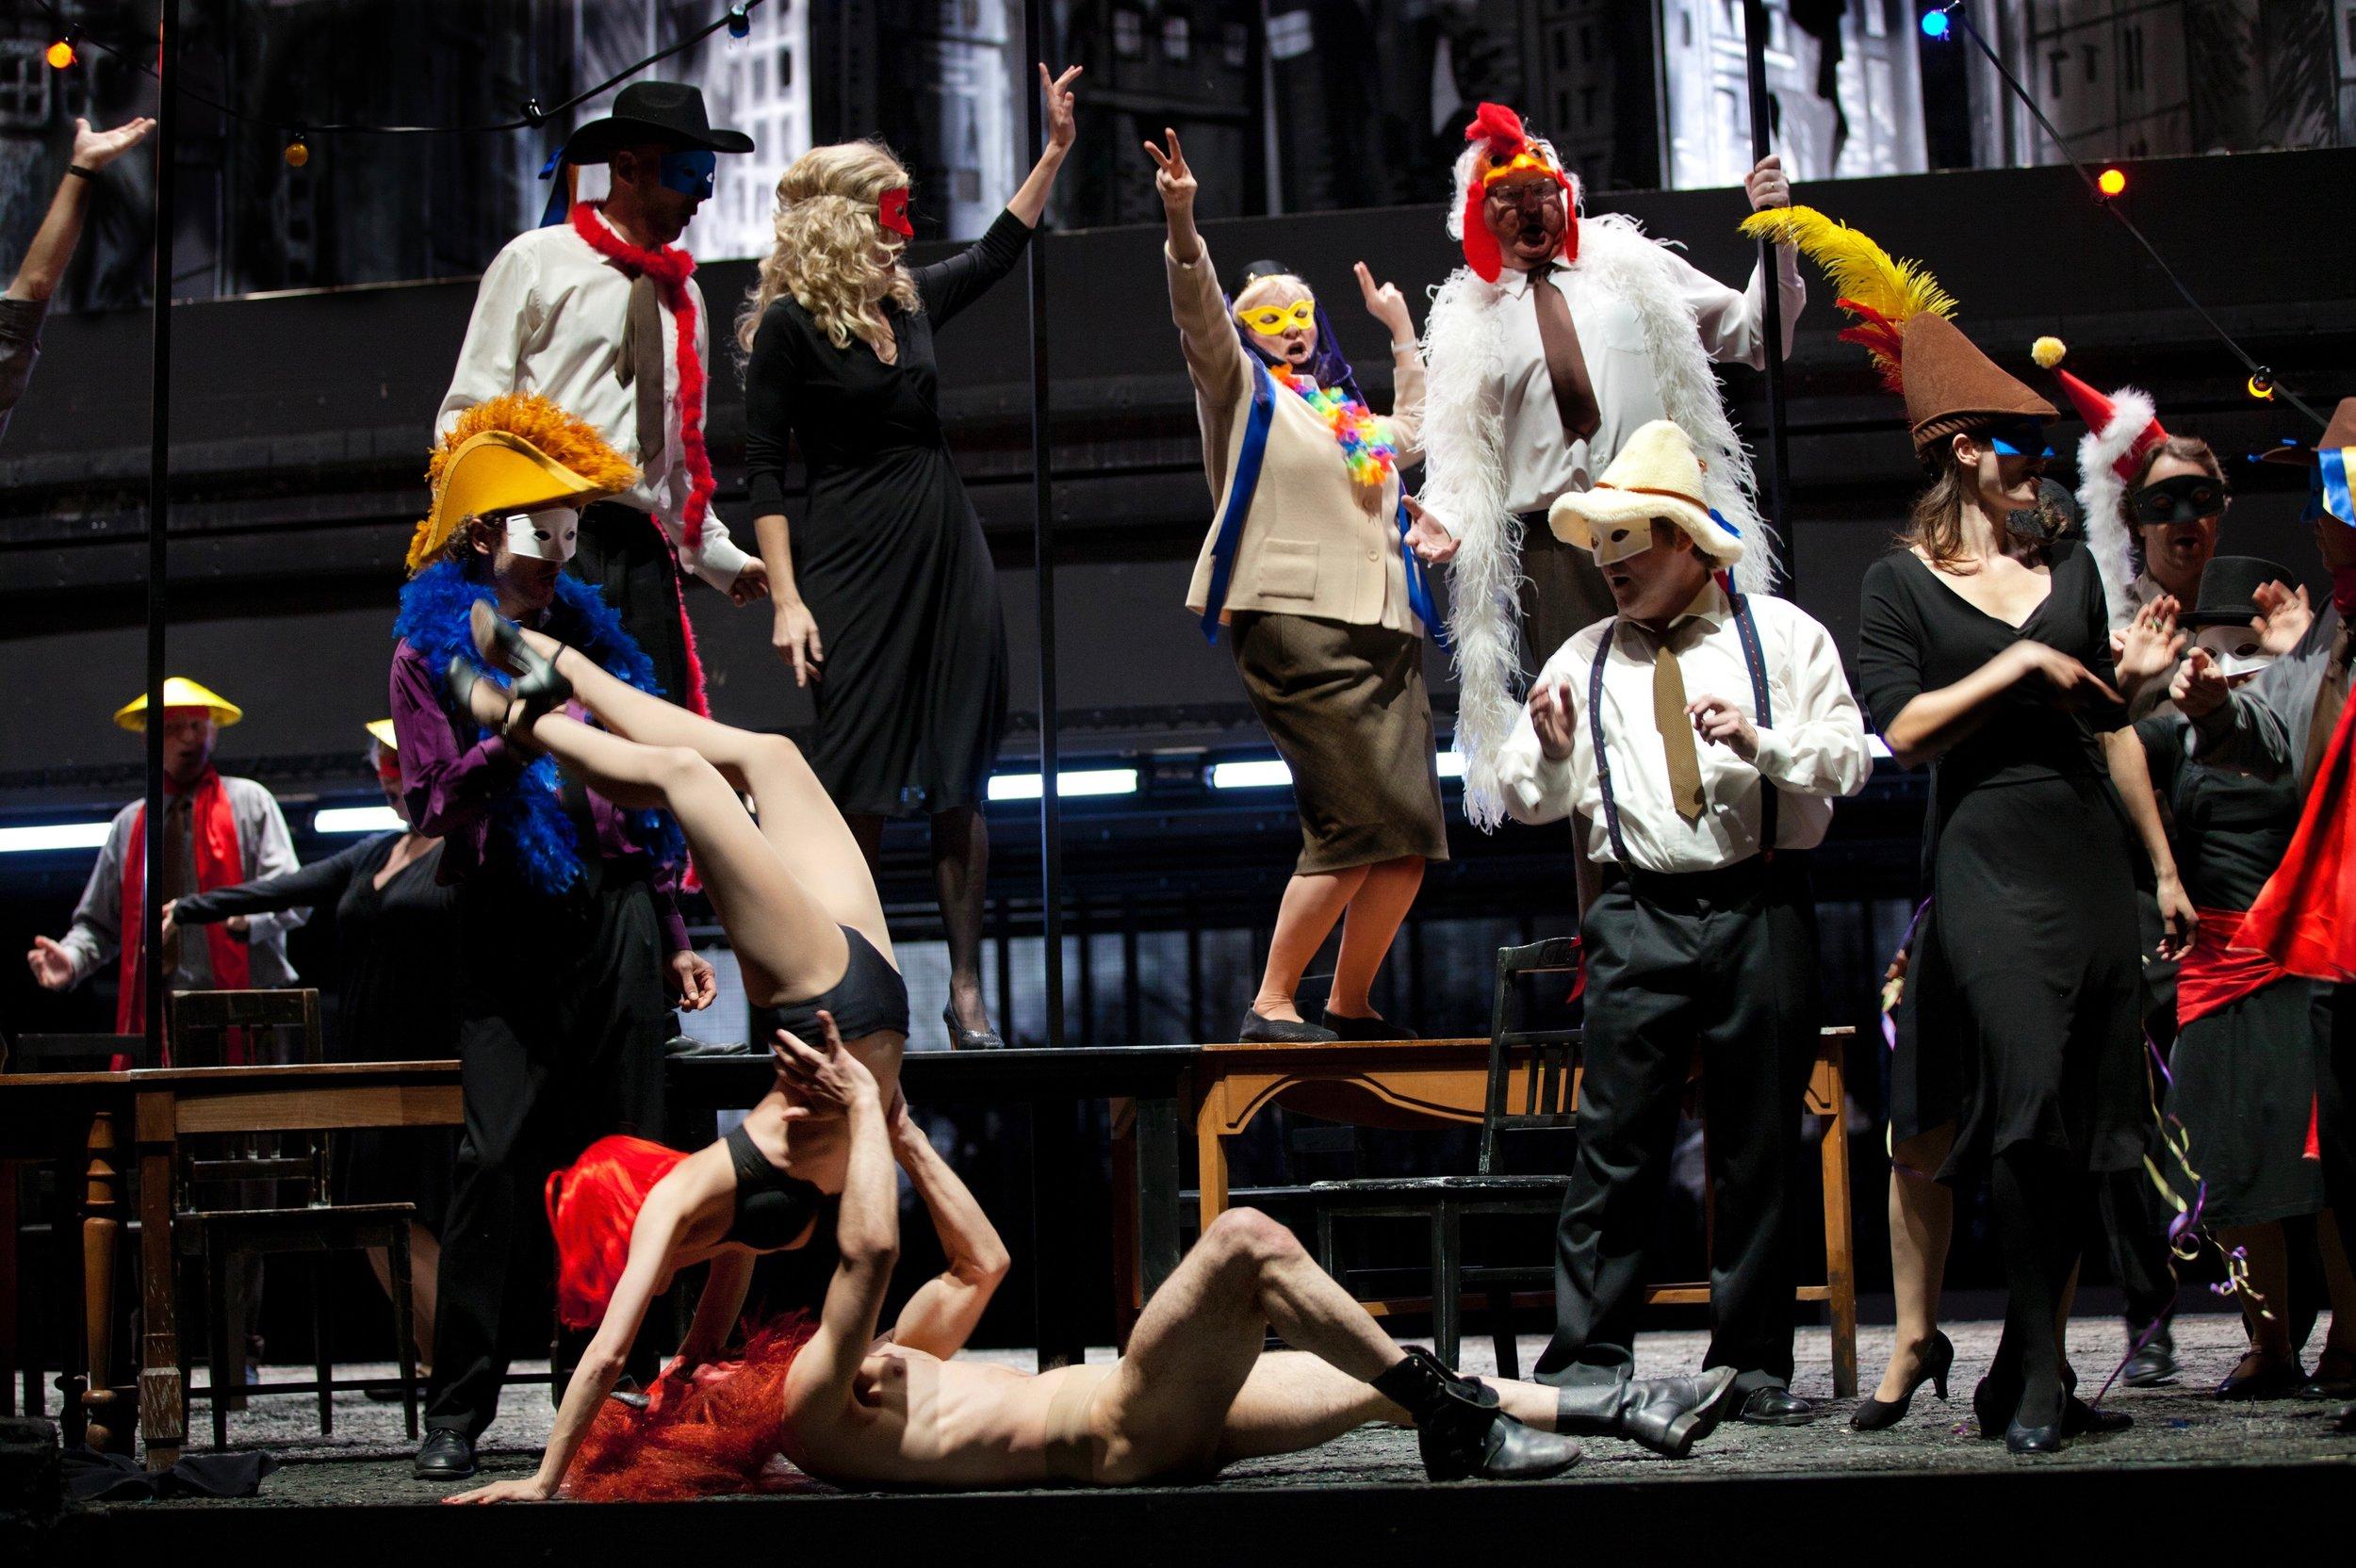 ROYAL DANISH OPERA / ROMEO & JULIET / COPENHAGEN 2011